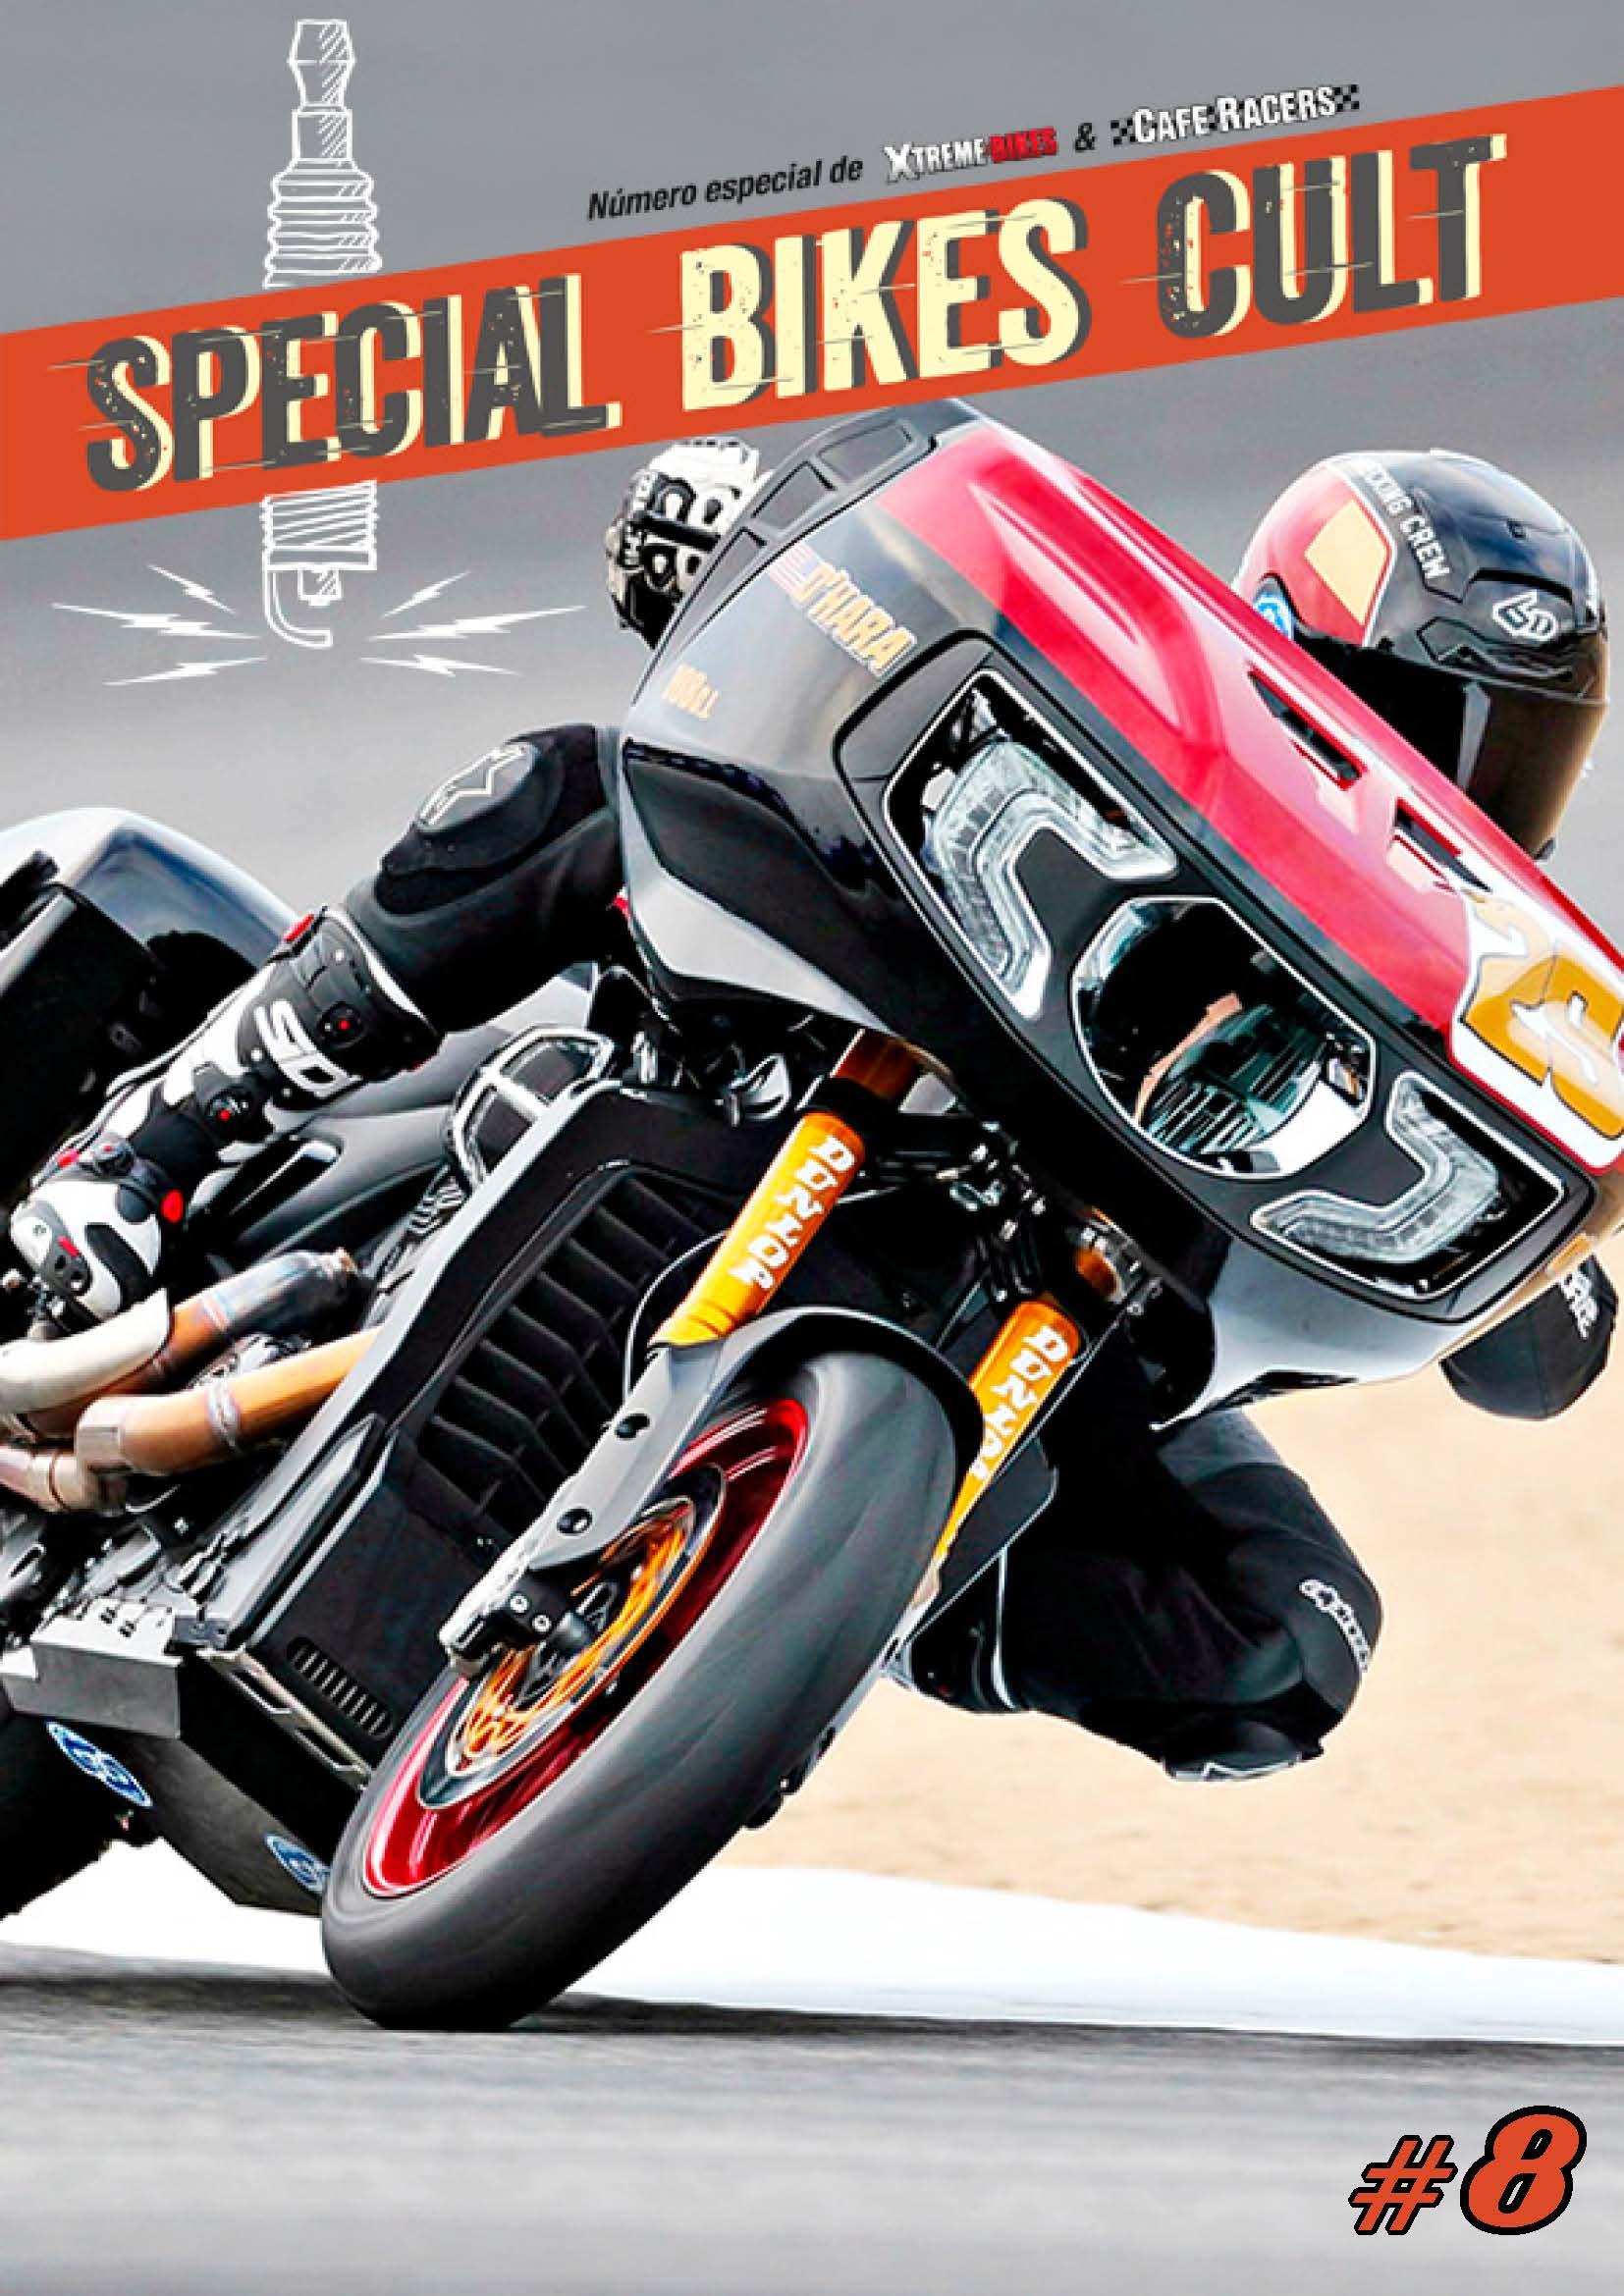 Special Bikes Cult #08